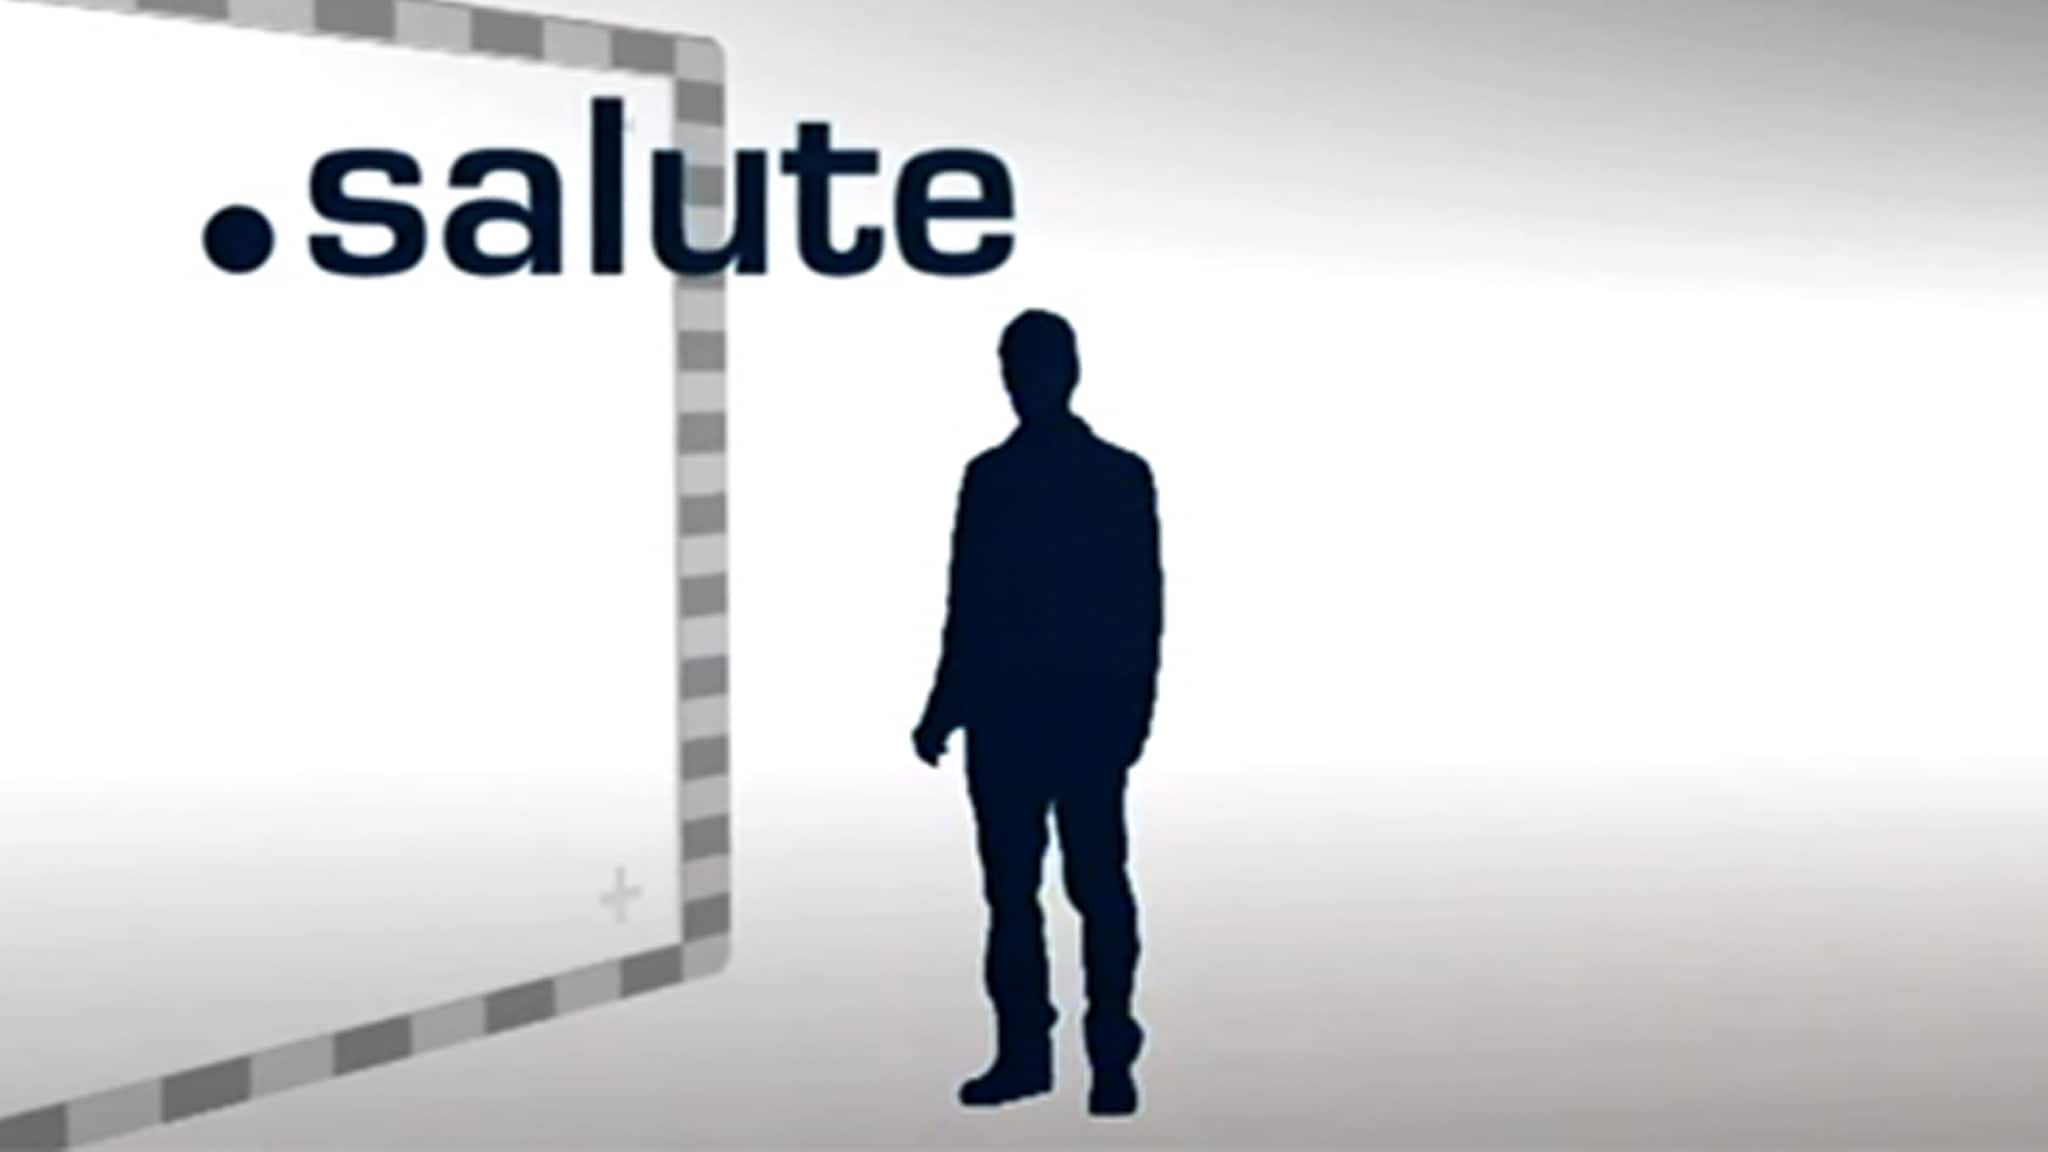 .salute - Life skills: Arosio